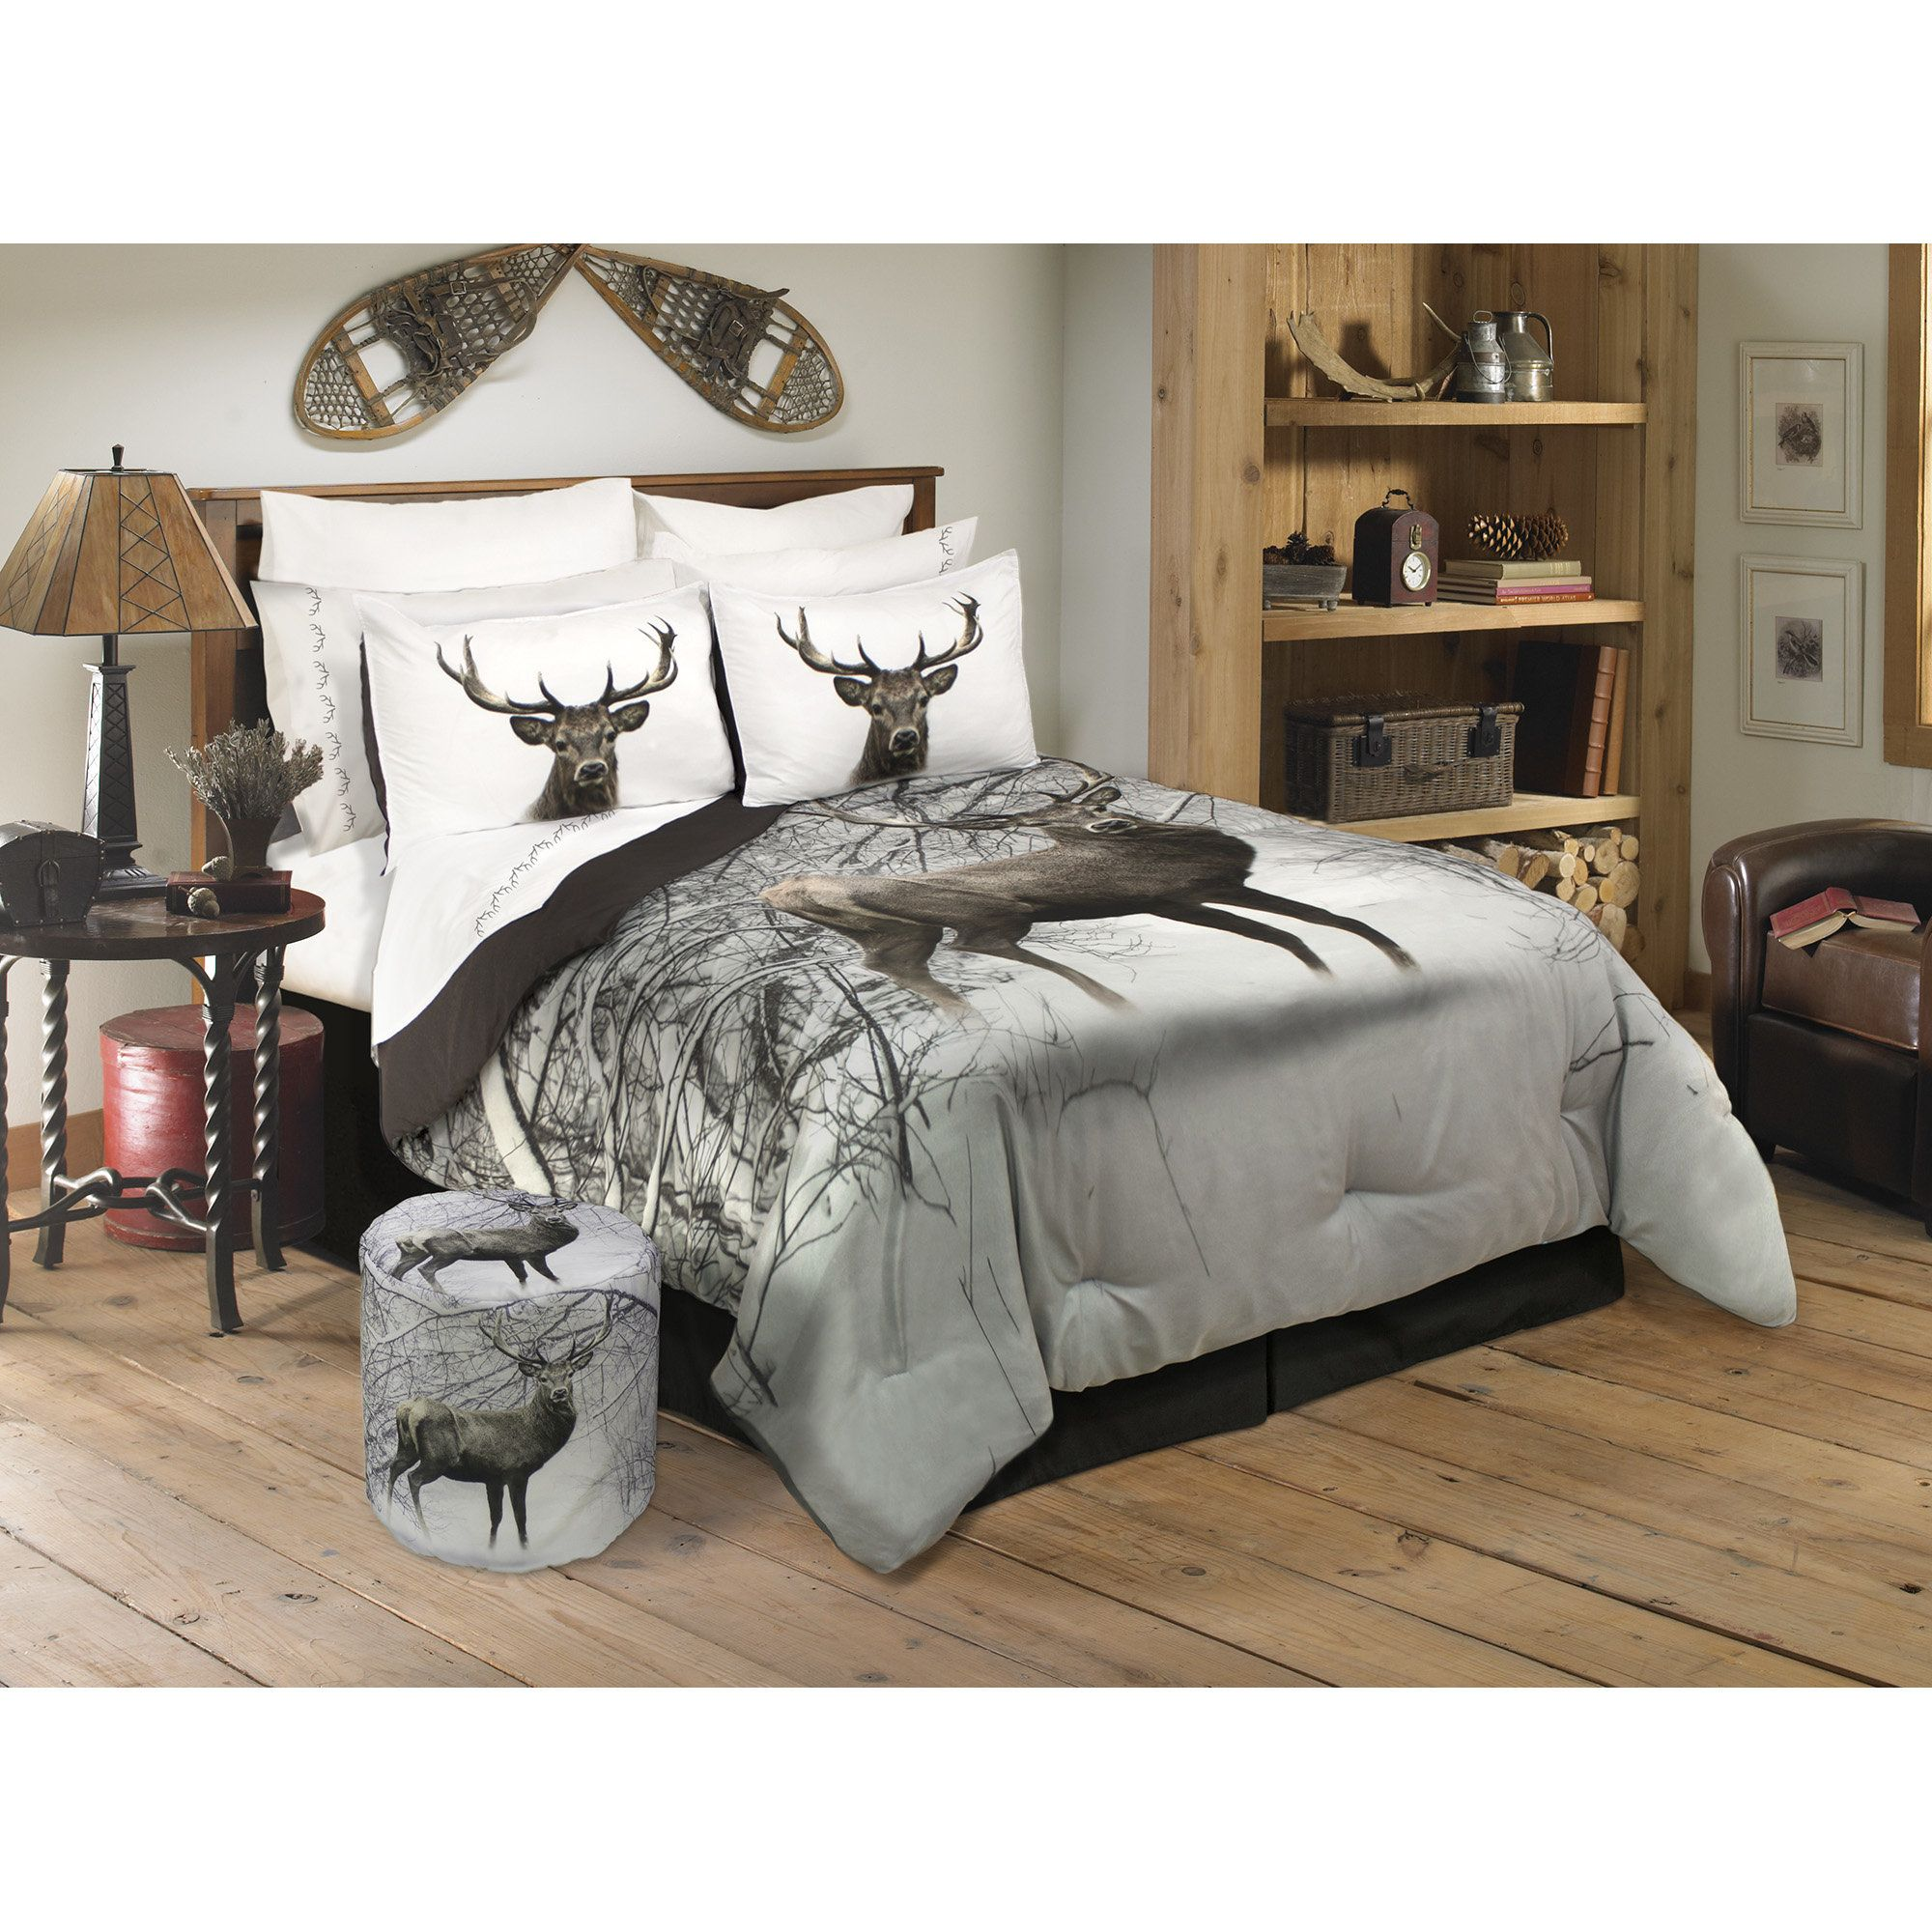 at pony bed bedding comforter jack hr wills bedeck for horse racing tokida linen main comforters sets joules